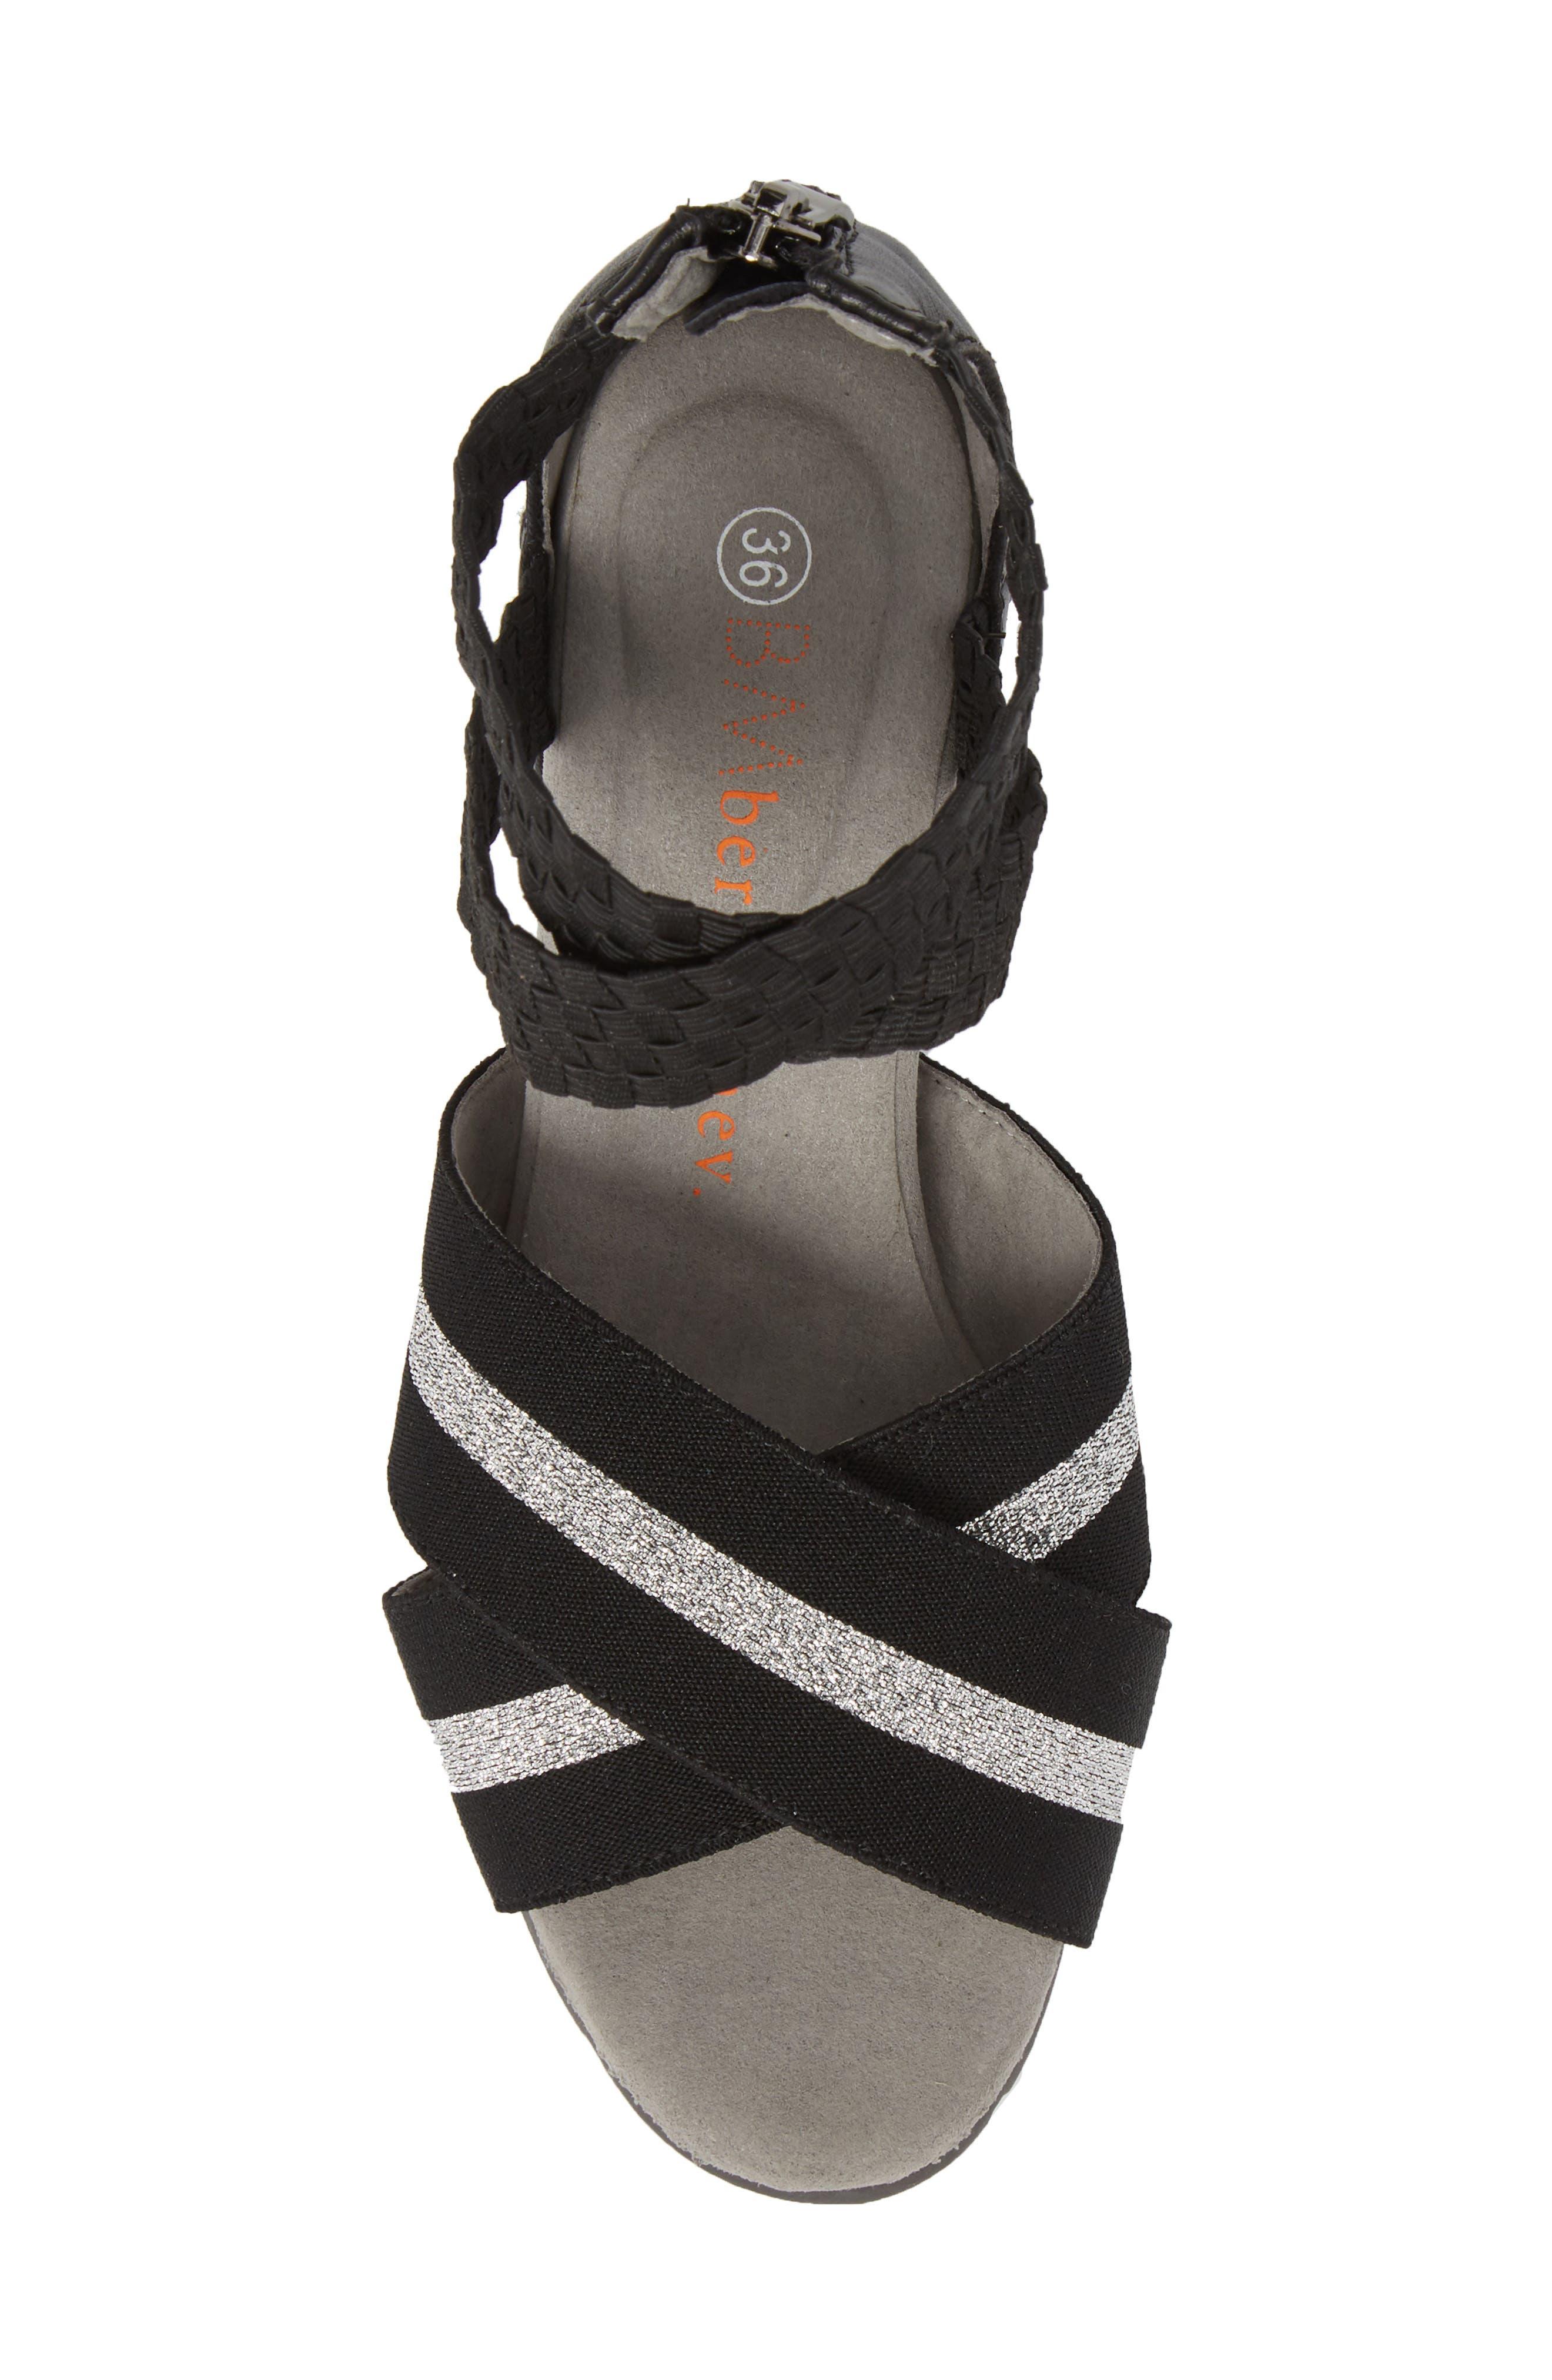 Maldives Wedge Sandal,                             Alternate thumbnail 5, color,                             BLACK FABRIC